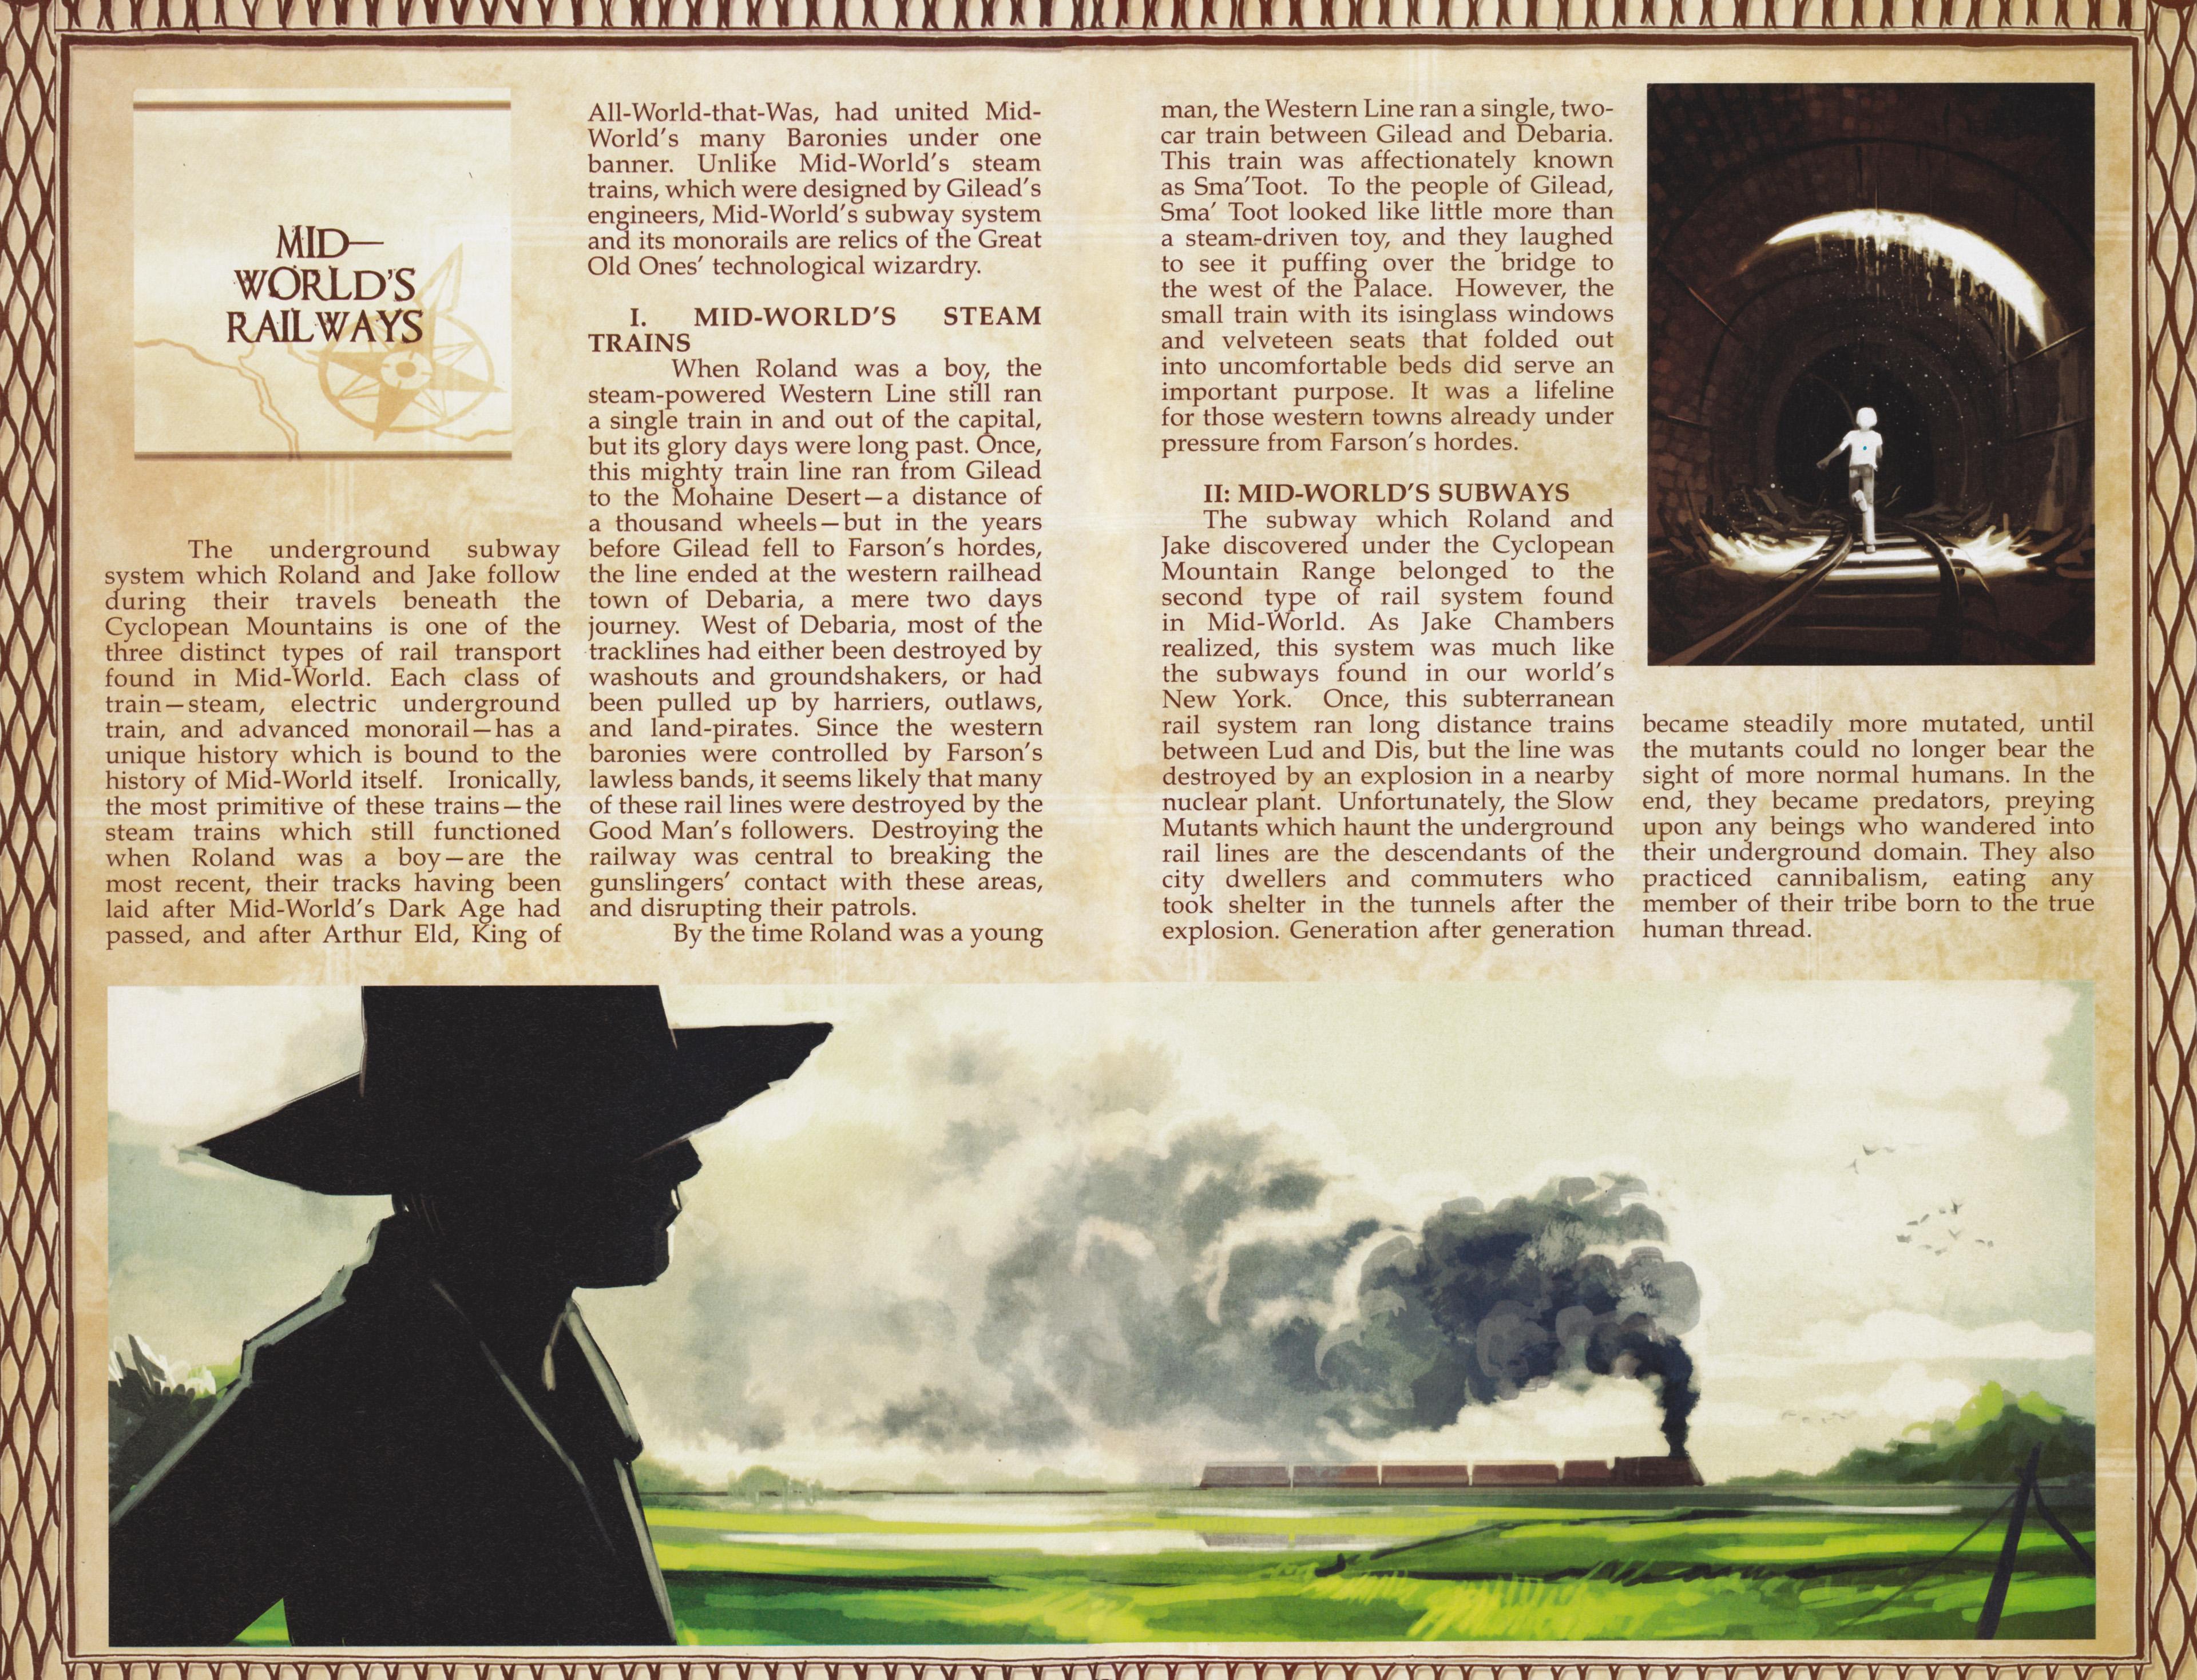 Read online Dark Tower: The Gunslinger - The Man in Black comic -  Issue #3 - 24